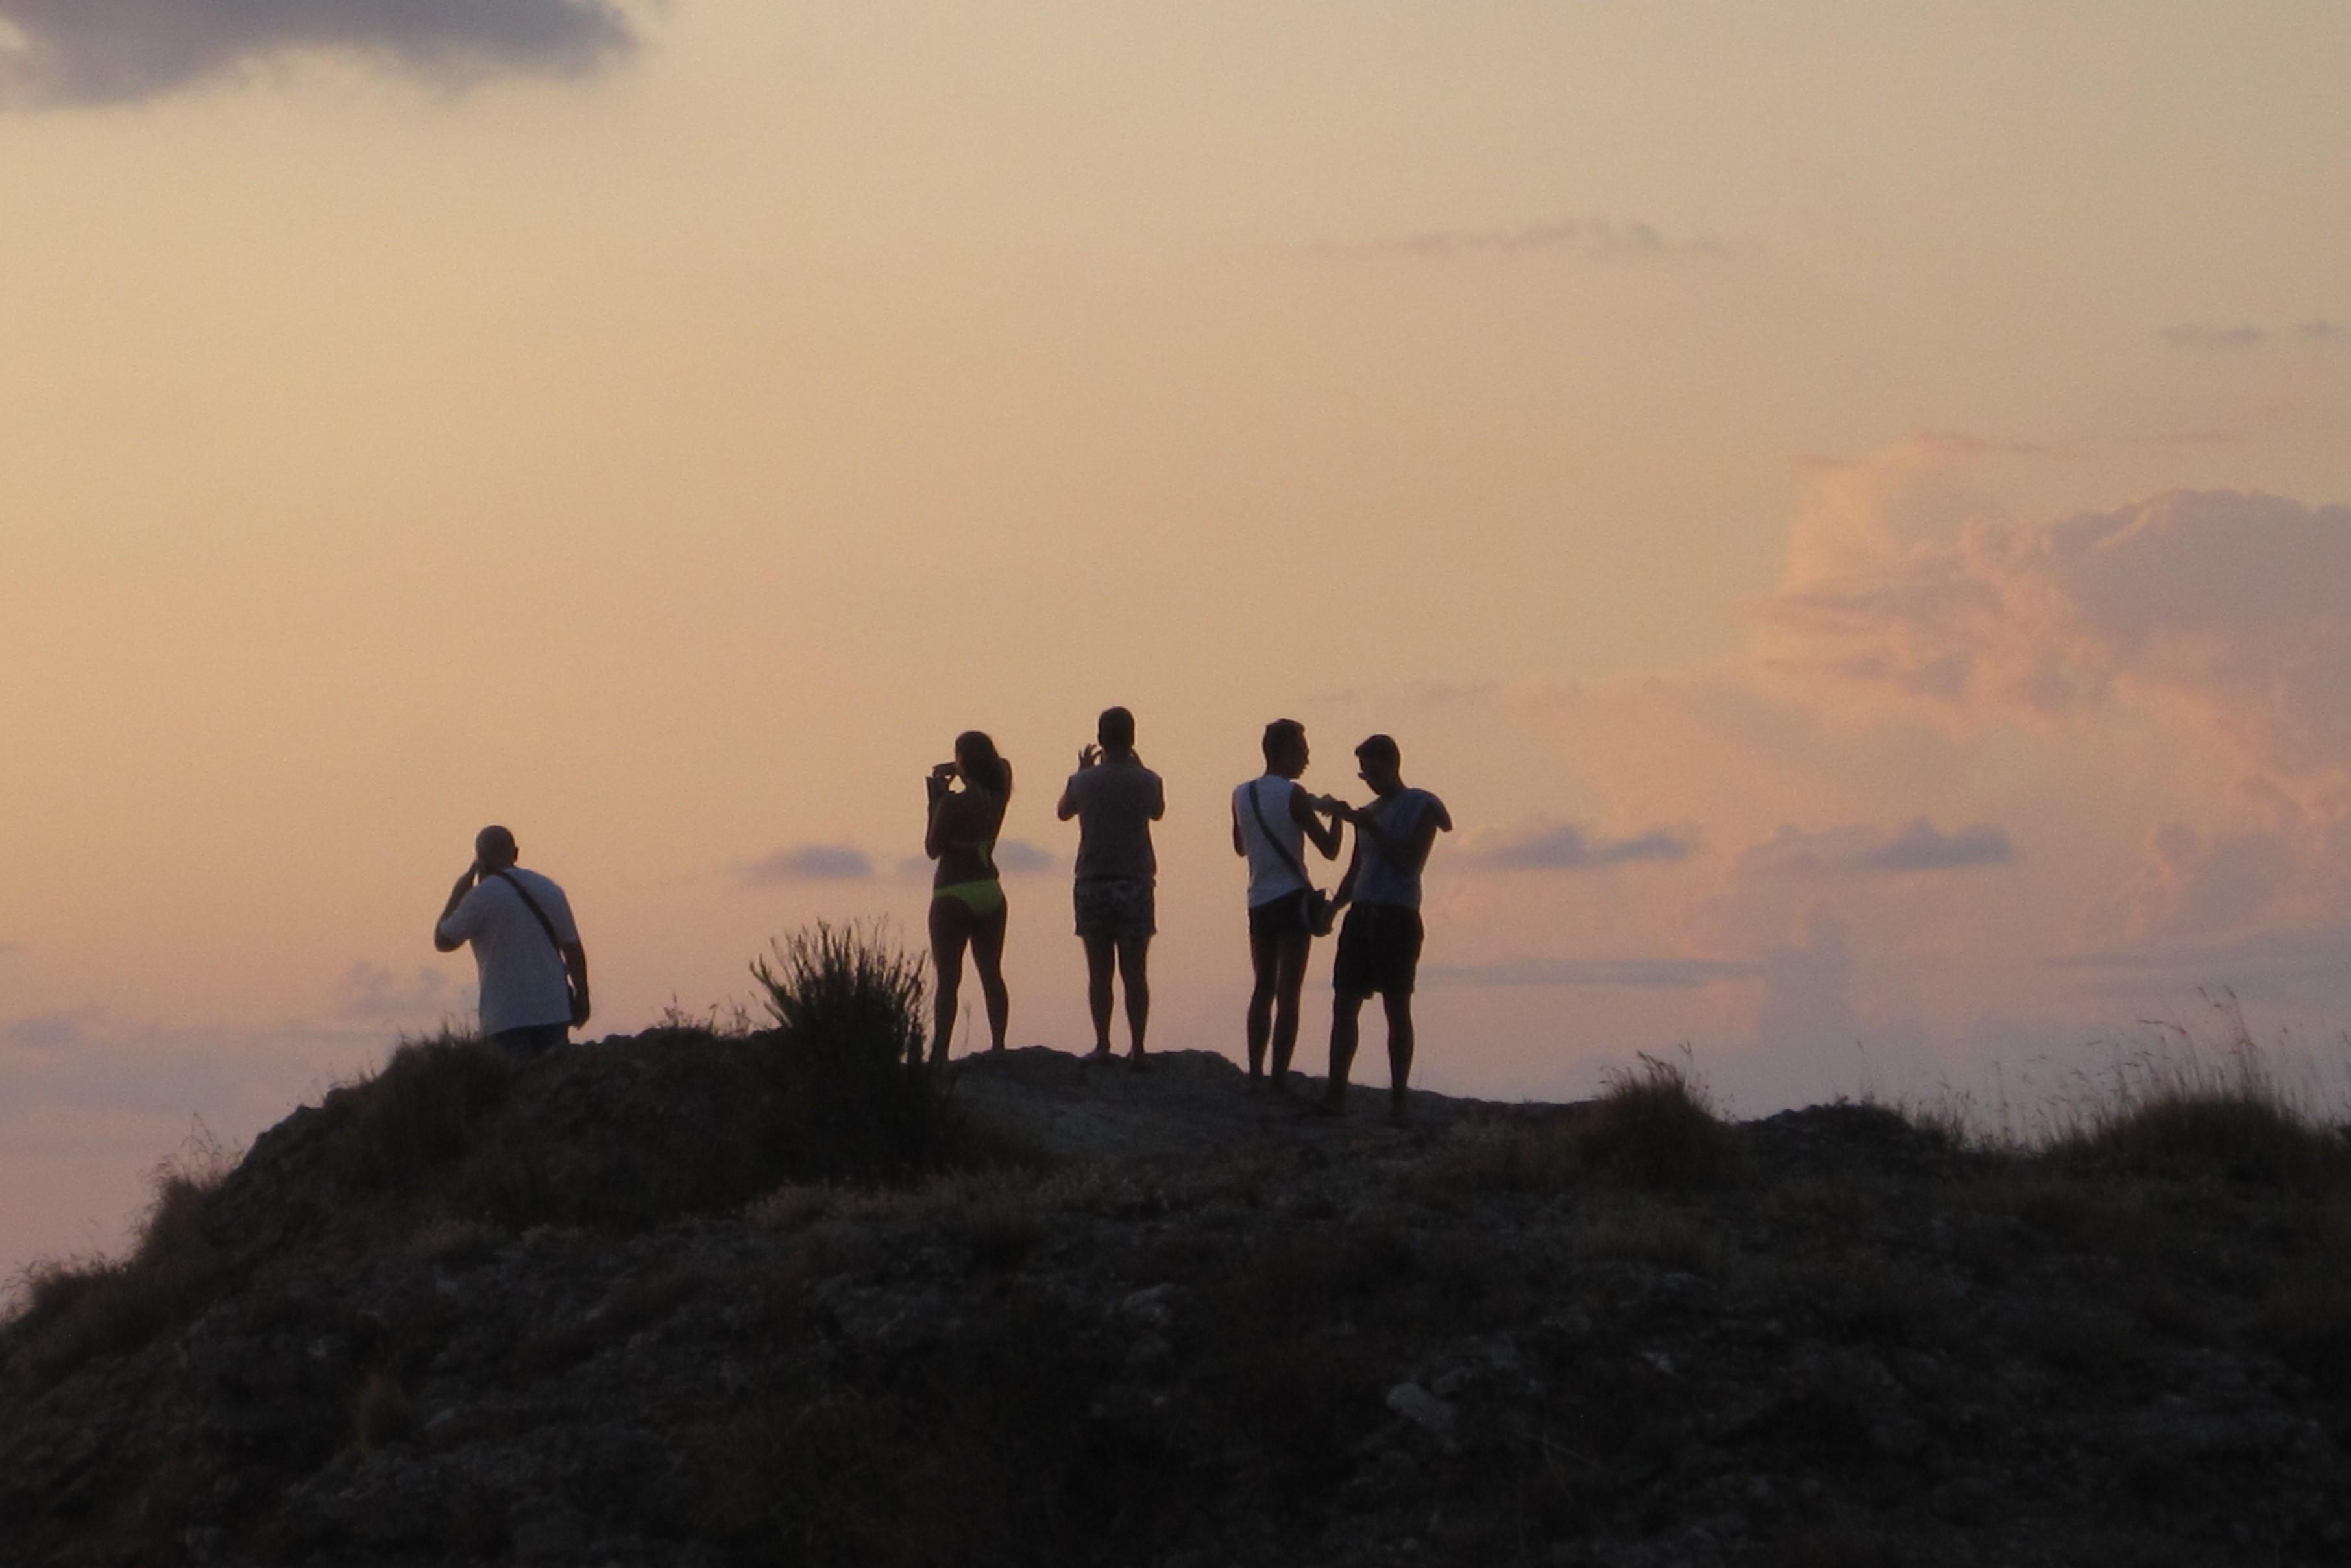 11 ragazzi tramontoJPG